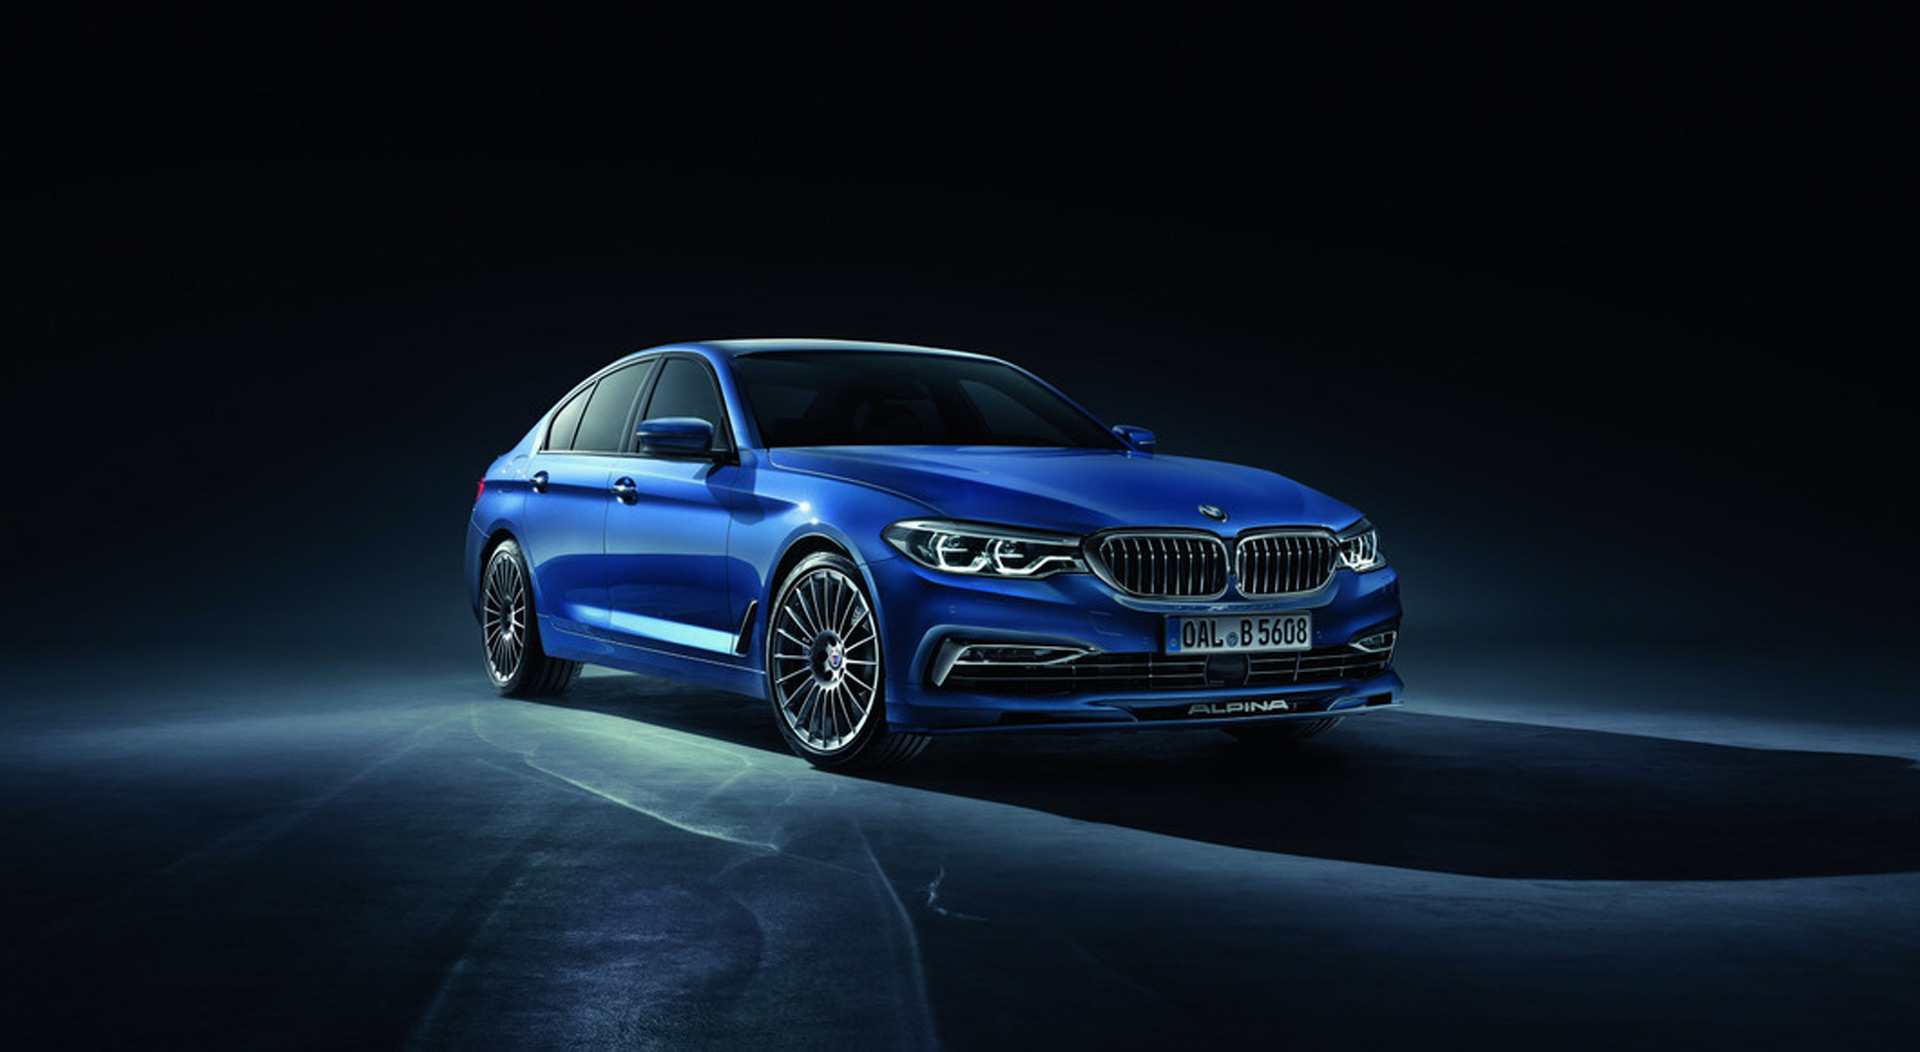 2018 BMW Alpina B5 bows with 600-hp V-8, all-wheel drive